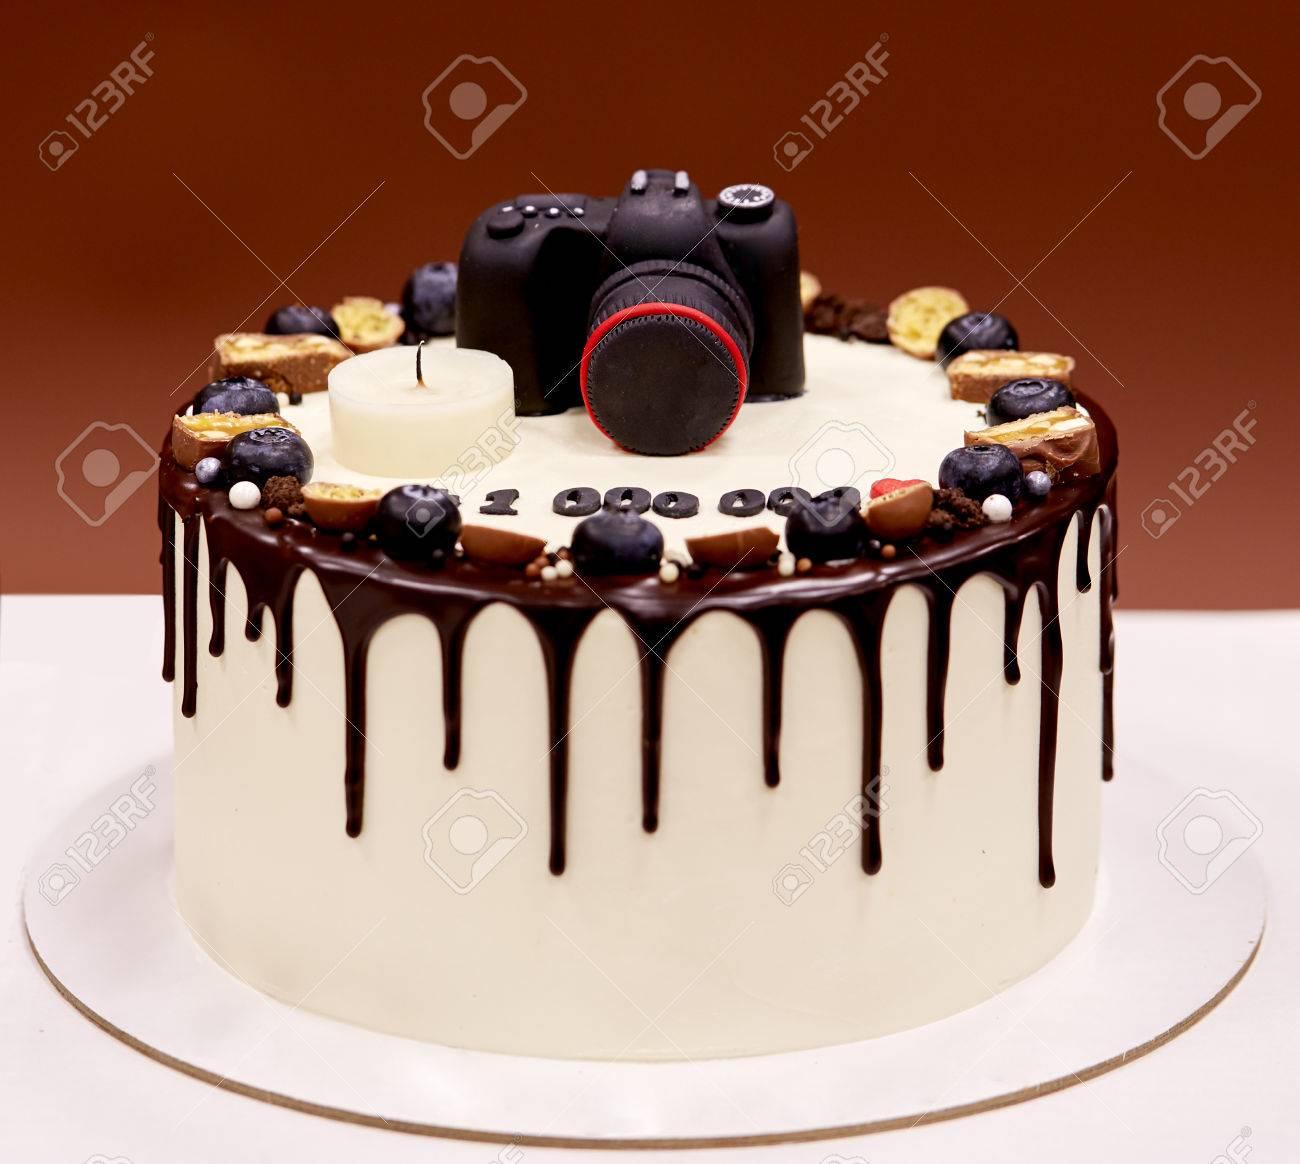 Remarkable Photographers Birthday Cake With A Photo Camera On Top Stock Photo Funny Birthday Cards Online Benoljebrpdamsfinfo